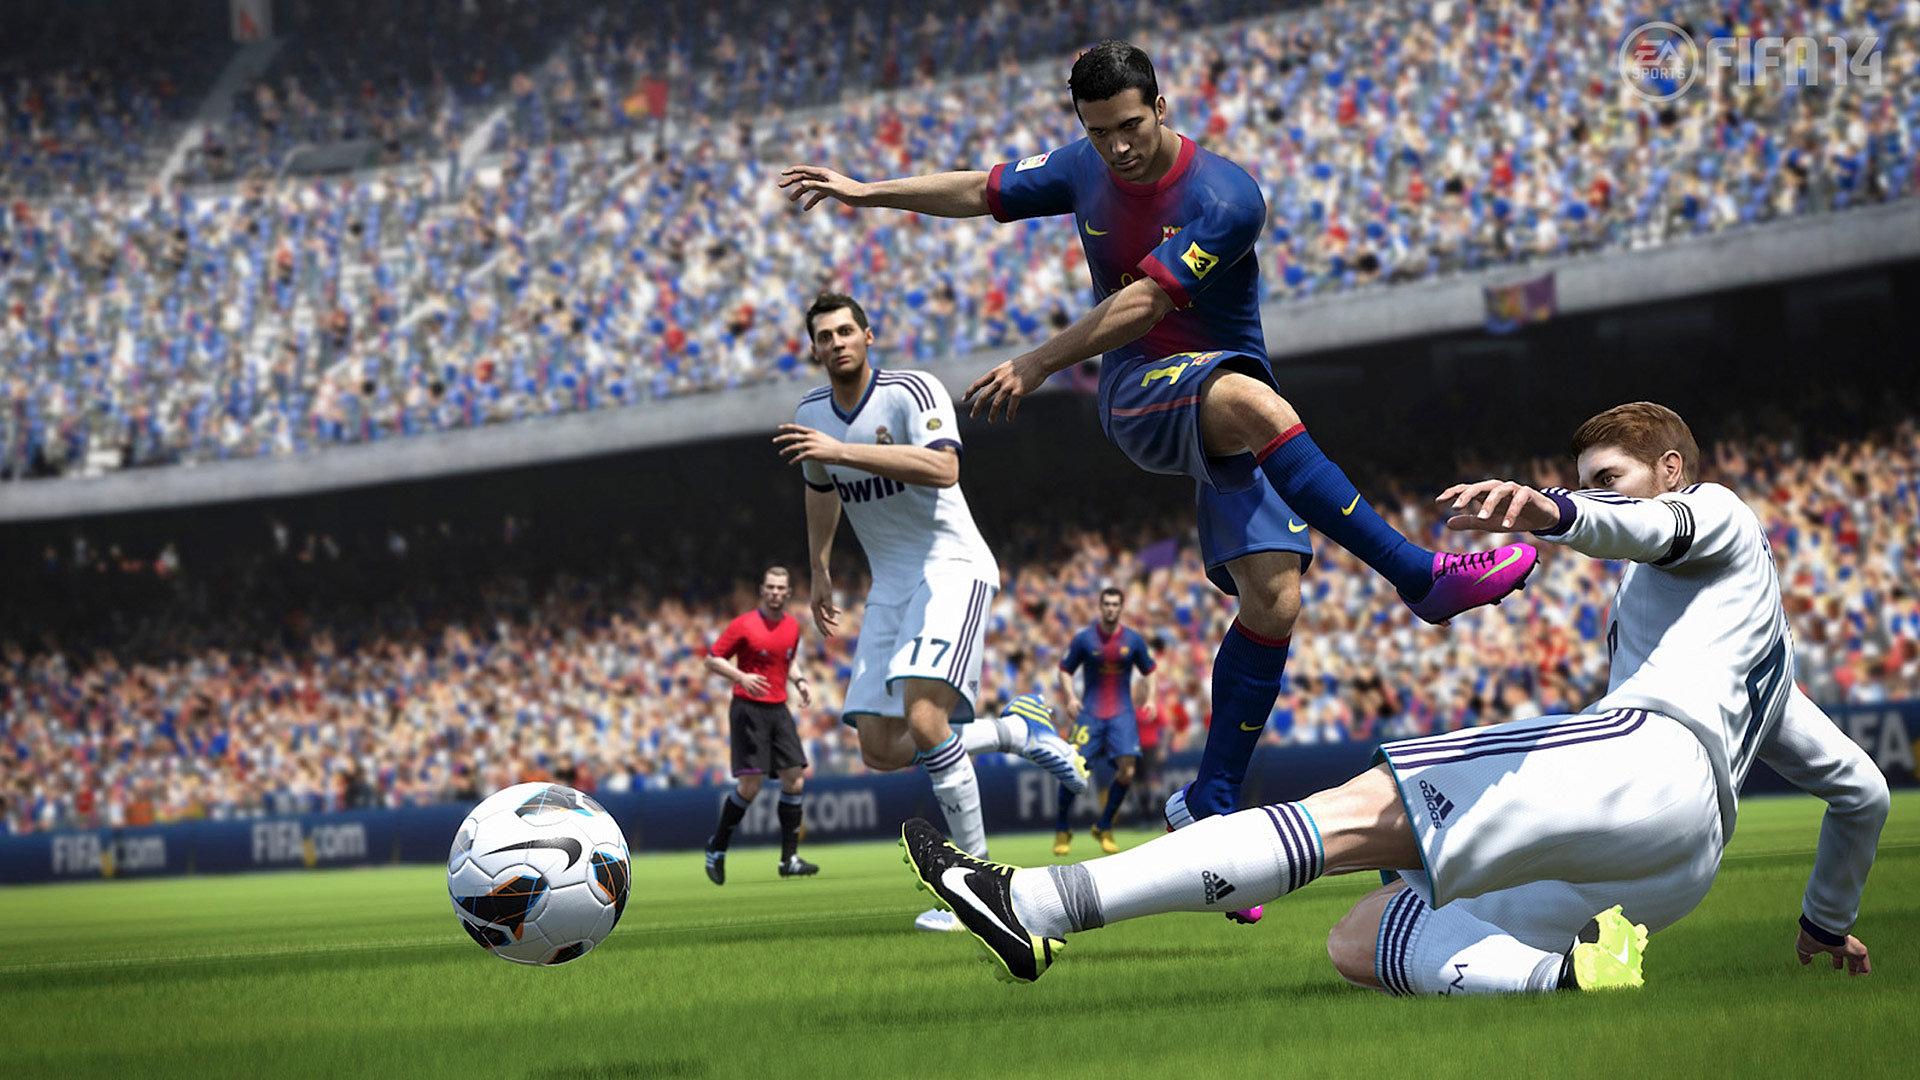 FIFA 14 (v.1.2.0.0) Ultimate Edition 2013 RUS RUS Multi,Repack от FileClub.